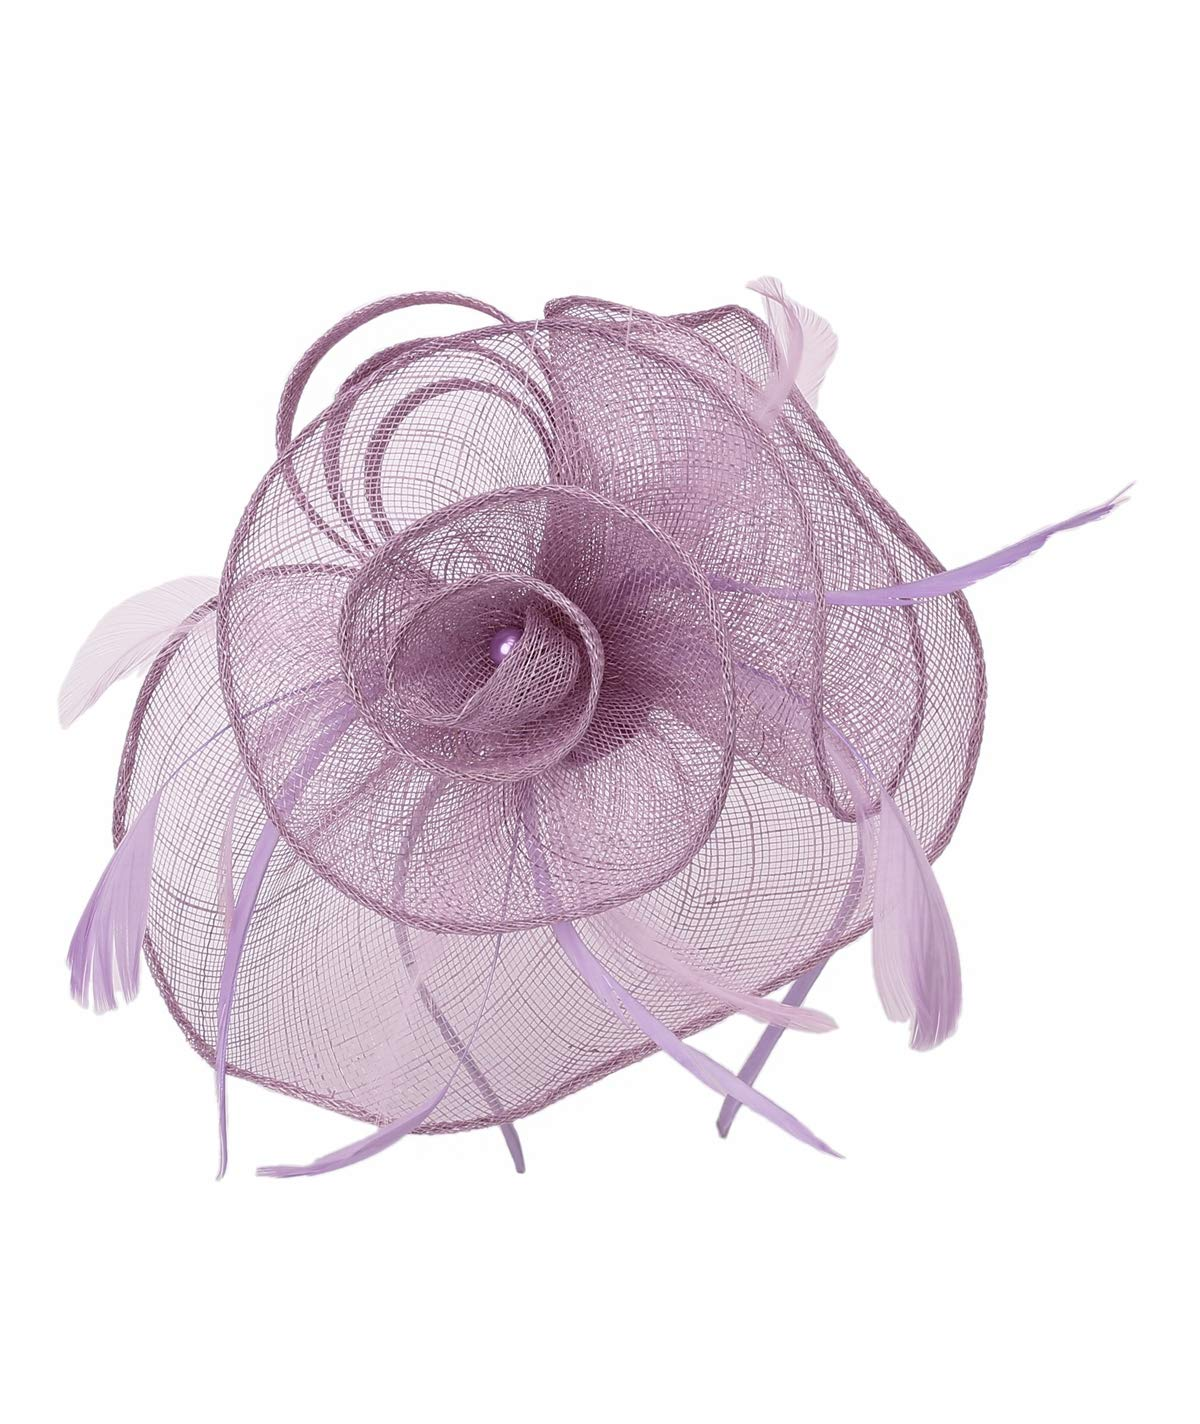 Felizhouse Sinamay Fascinators Wedding Derby Hats Women Cocktail Tea Party Headband Ladies Head Piece Pillbox Hat Hair Clip (Sinamay Pearl - Purple)